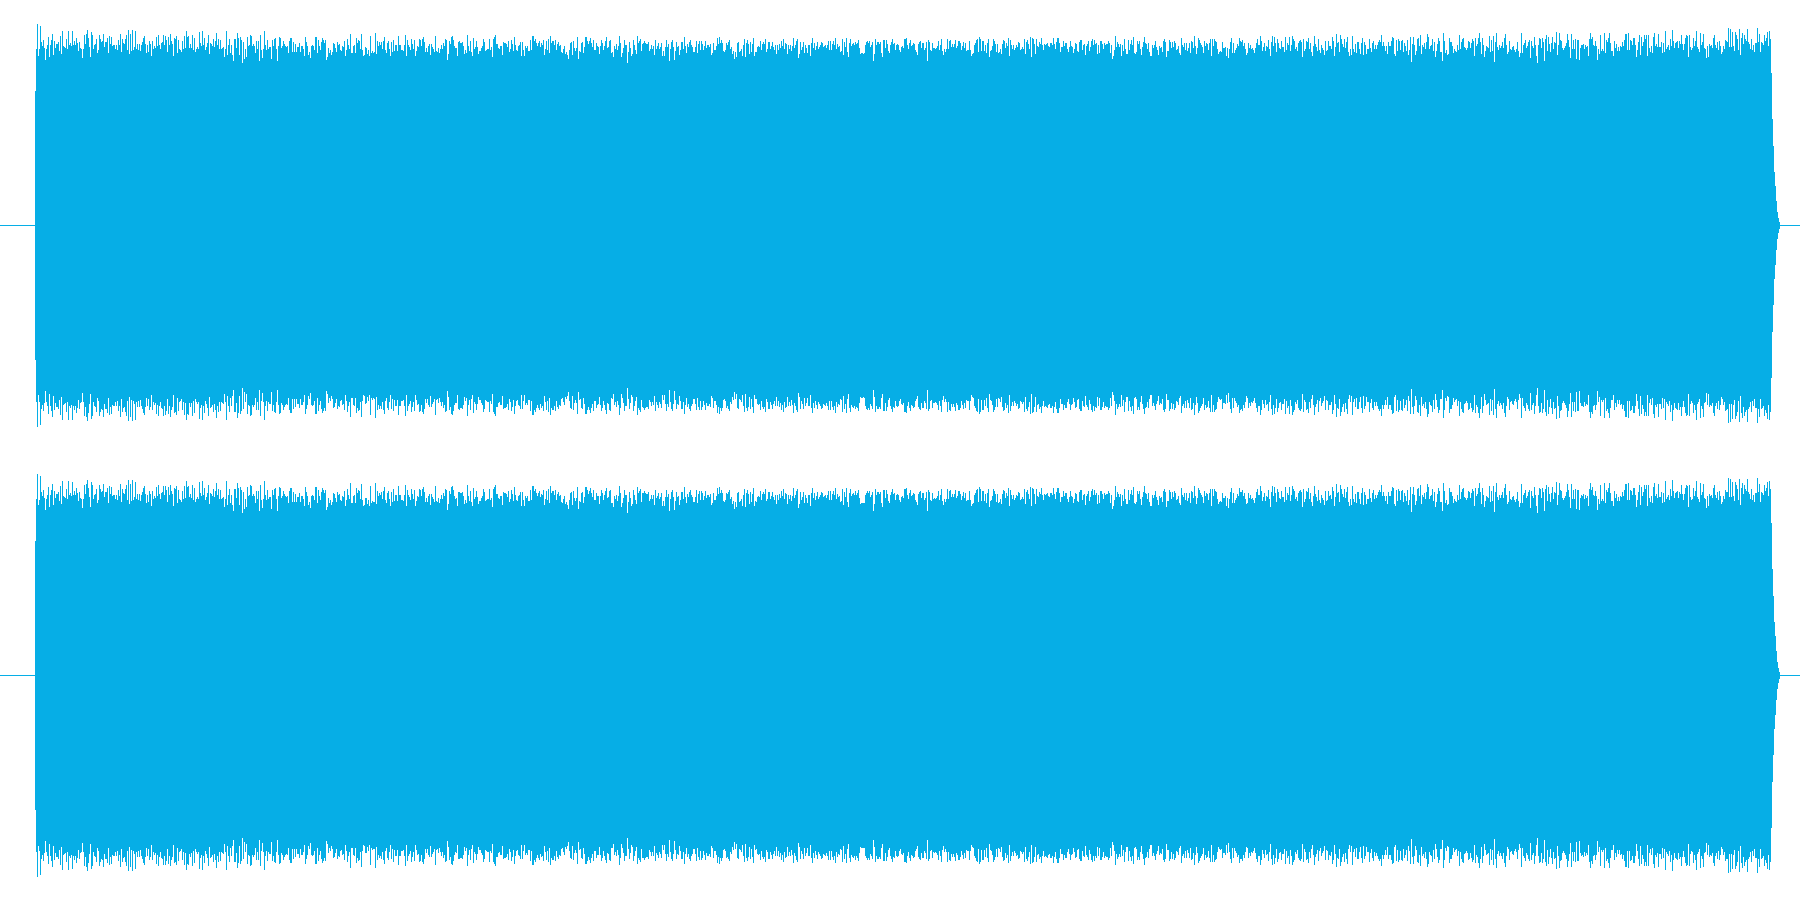 【NES 汎用01-17(スウィープ)】の再生済みの波形